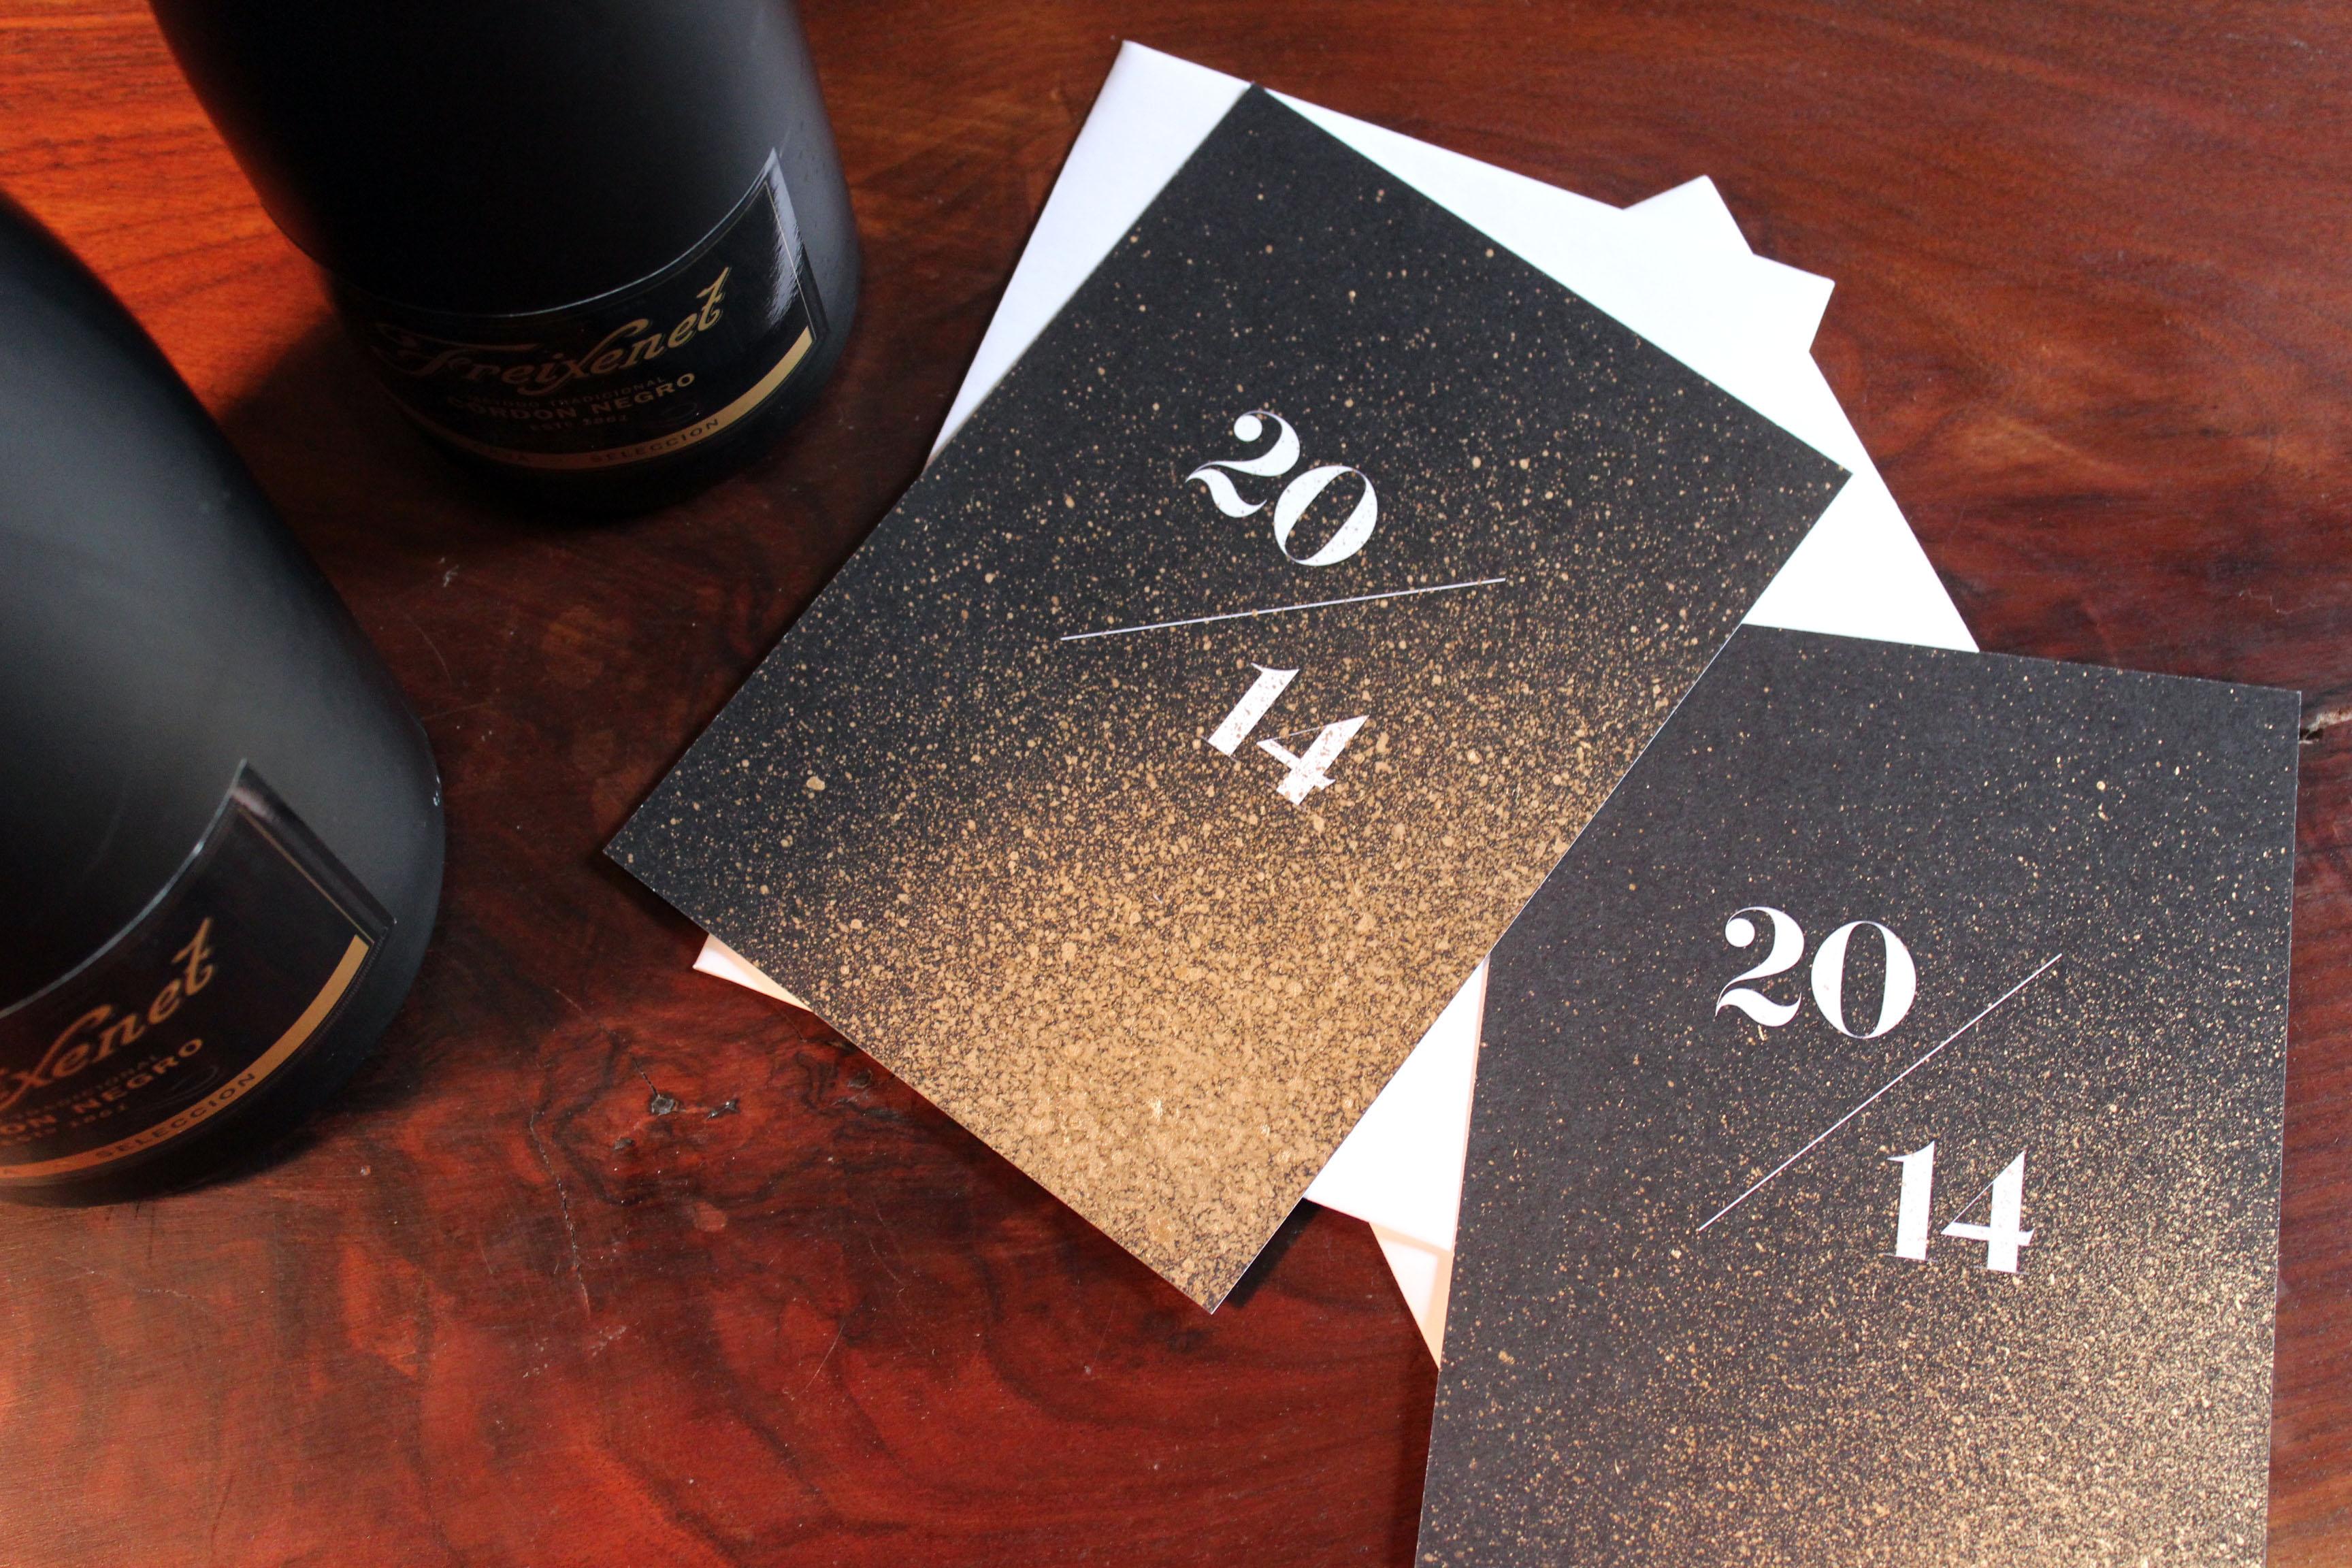 gilded new years eve 2014 union jack creative